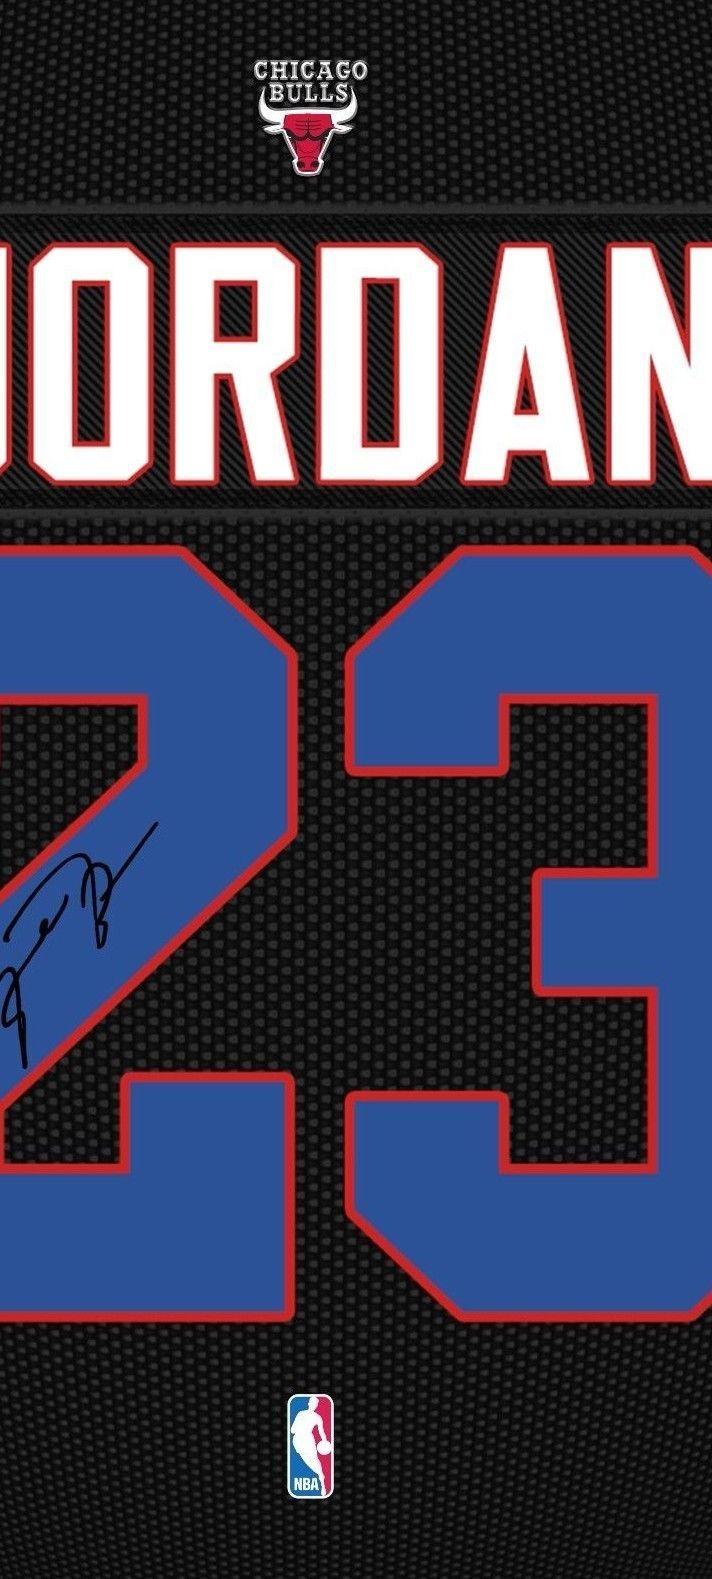 Michael Jordan Chicago Bulls signed autograph Framed printed 100% COTTON Canvas